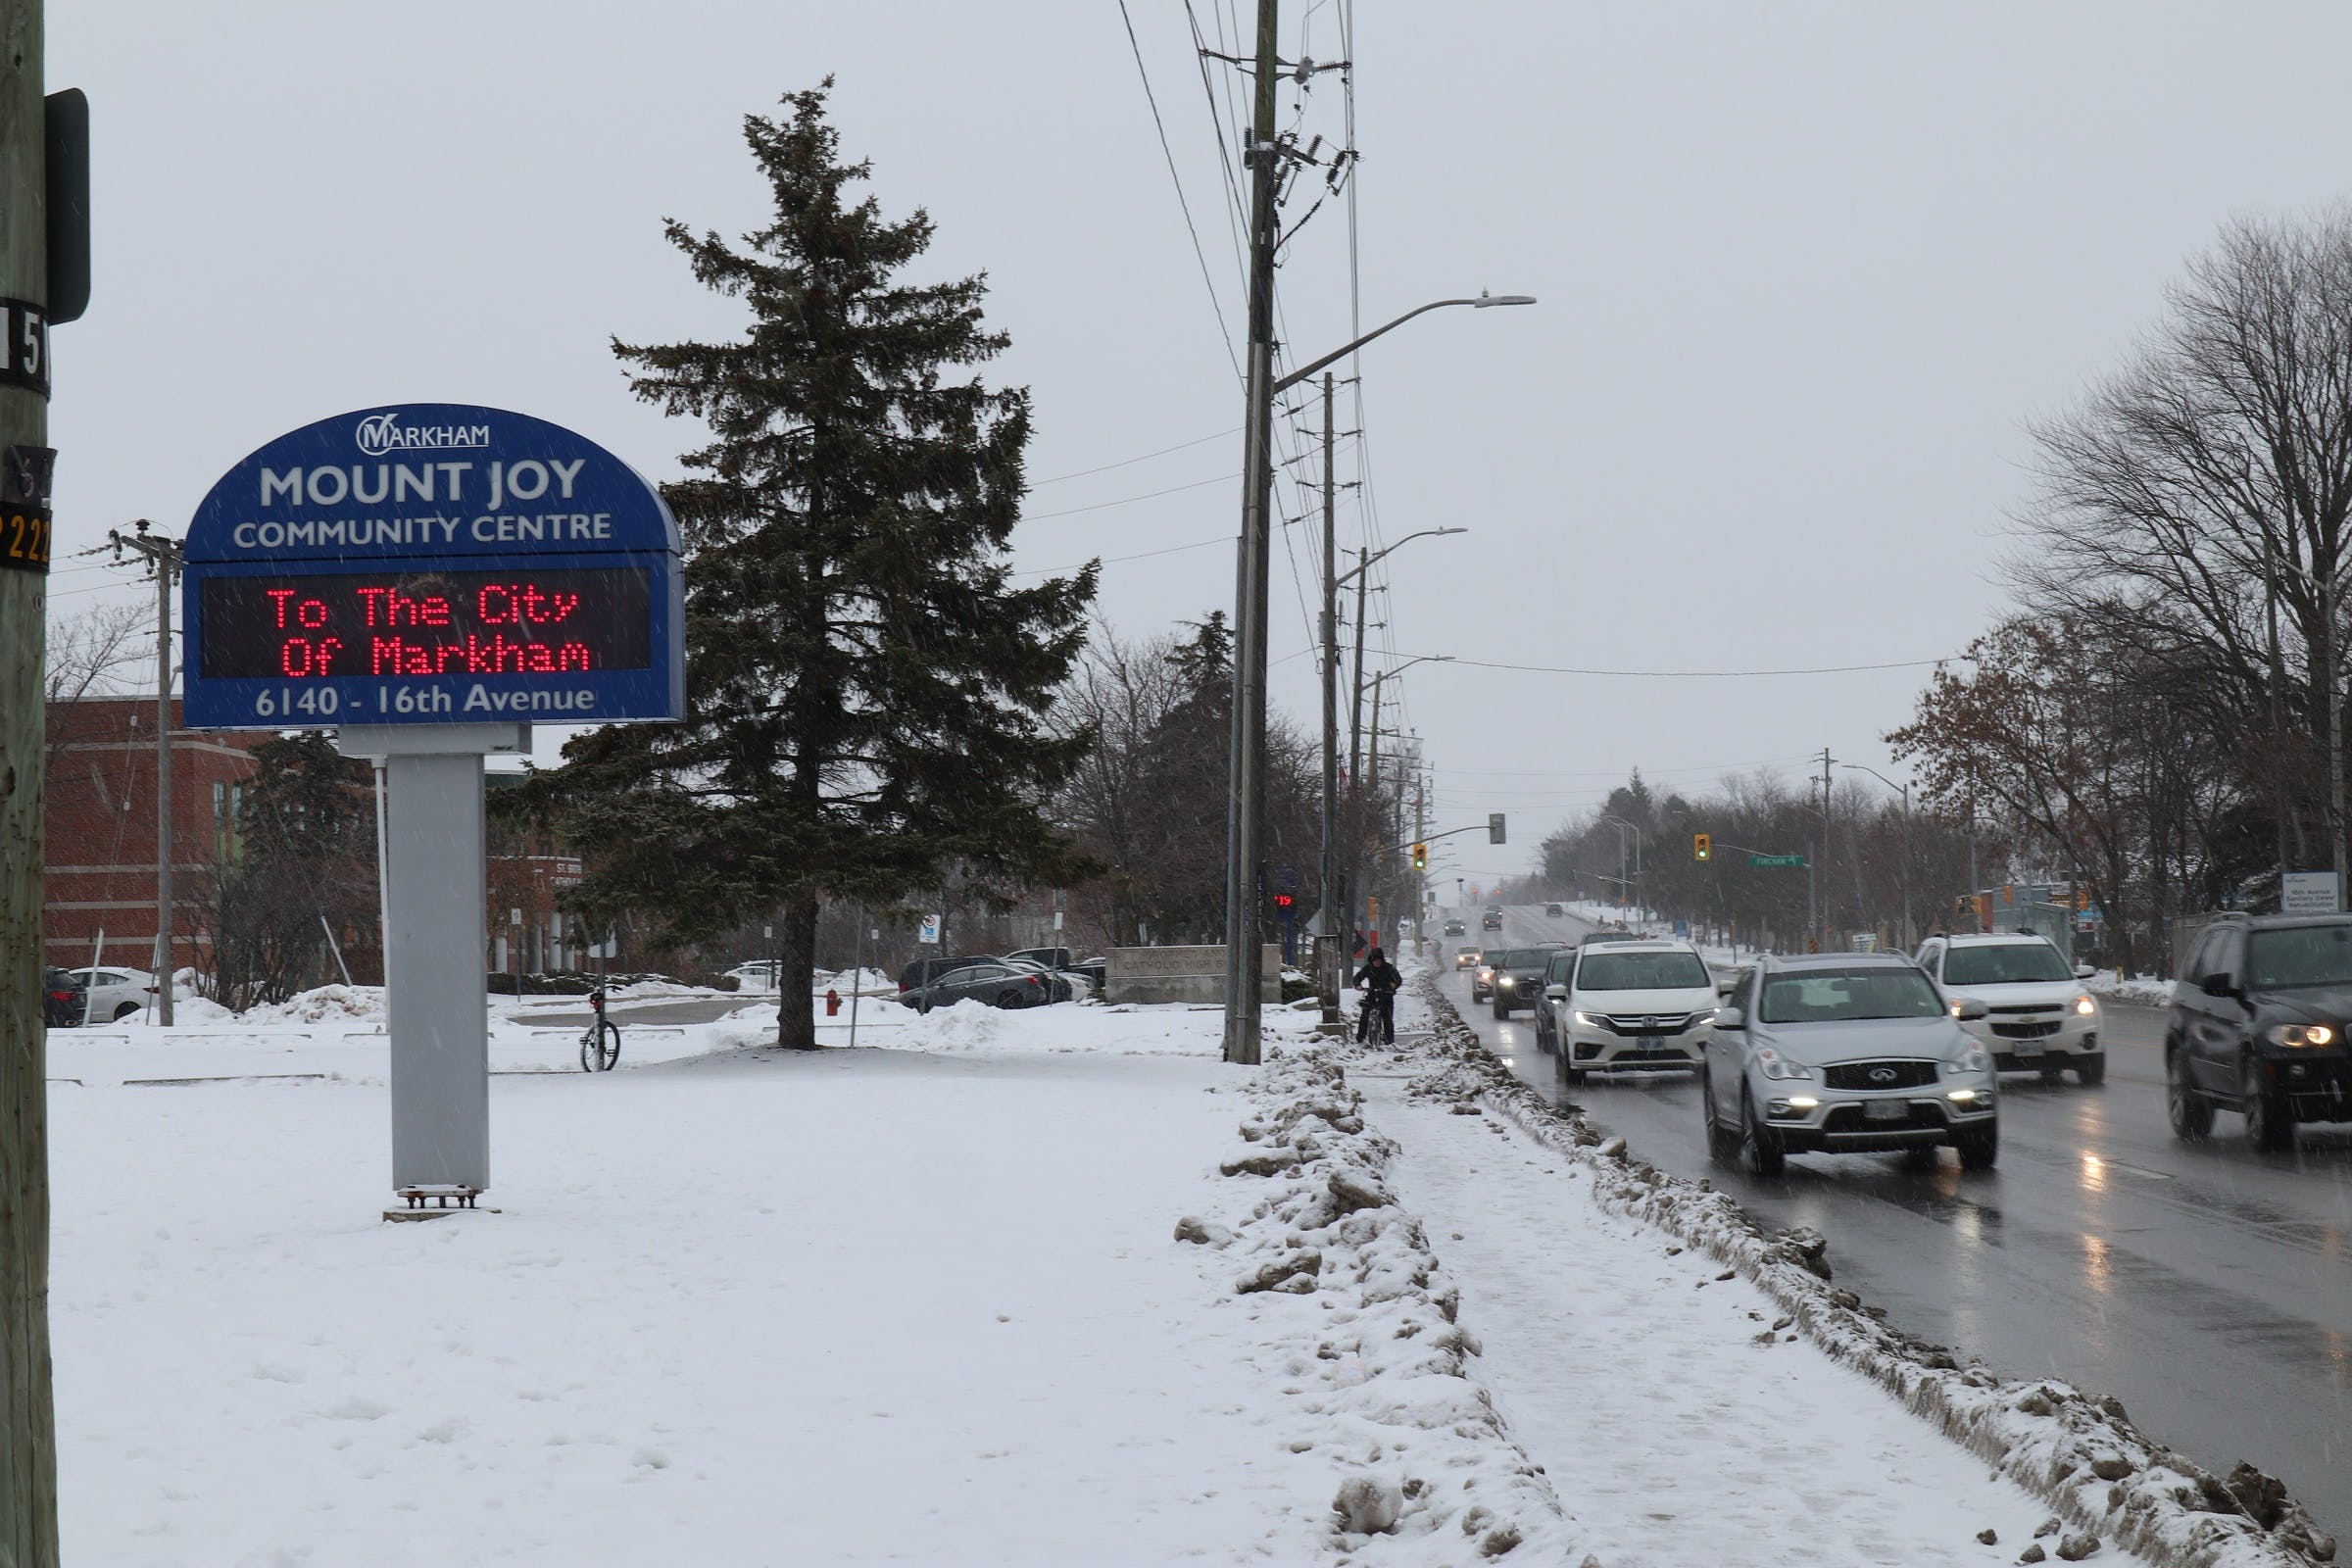 16th Avenue looking east toward the Mount Joy Community Centre